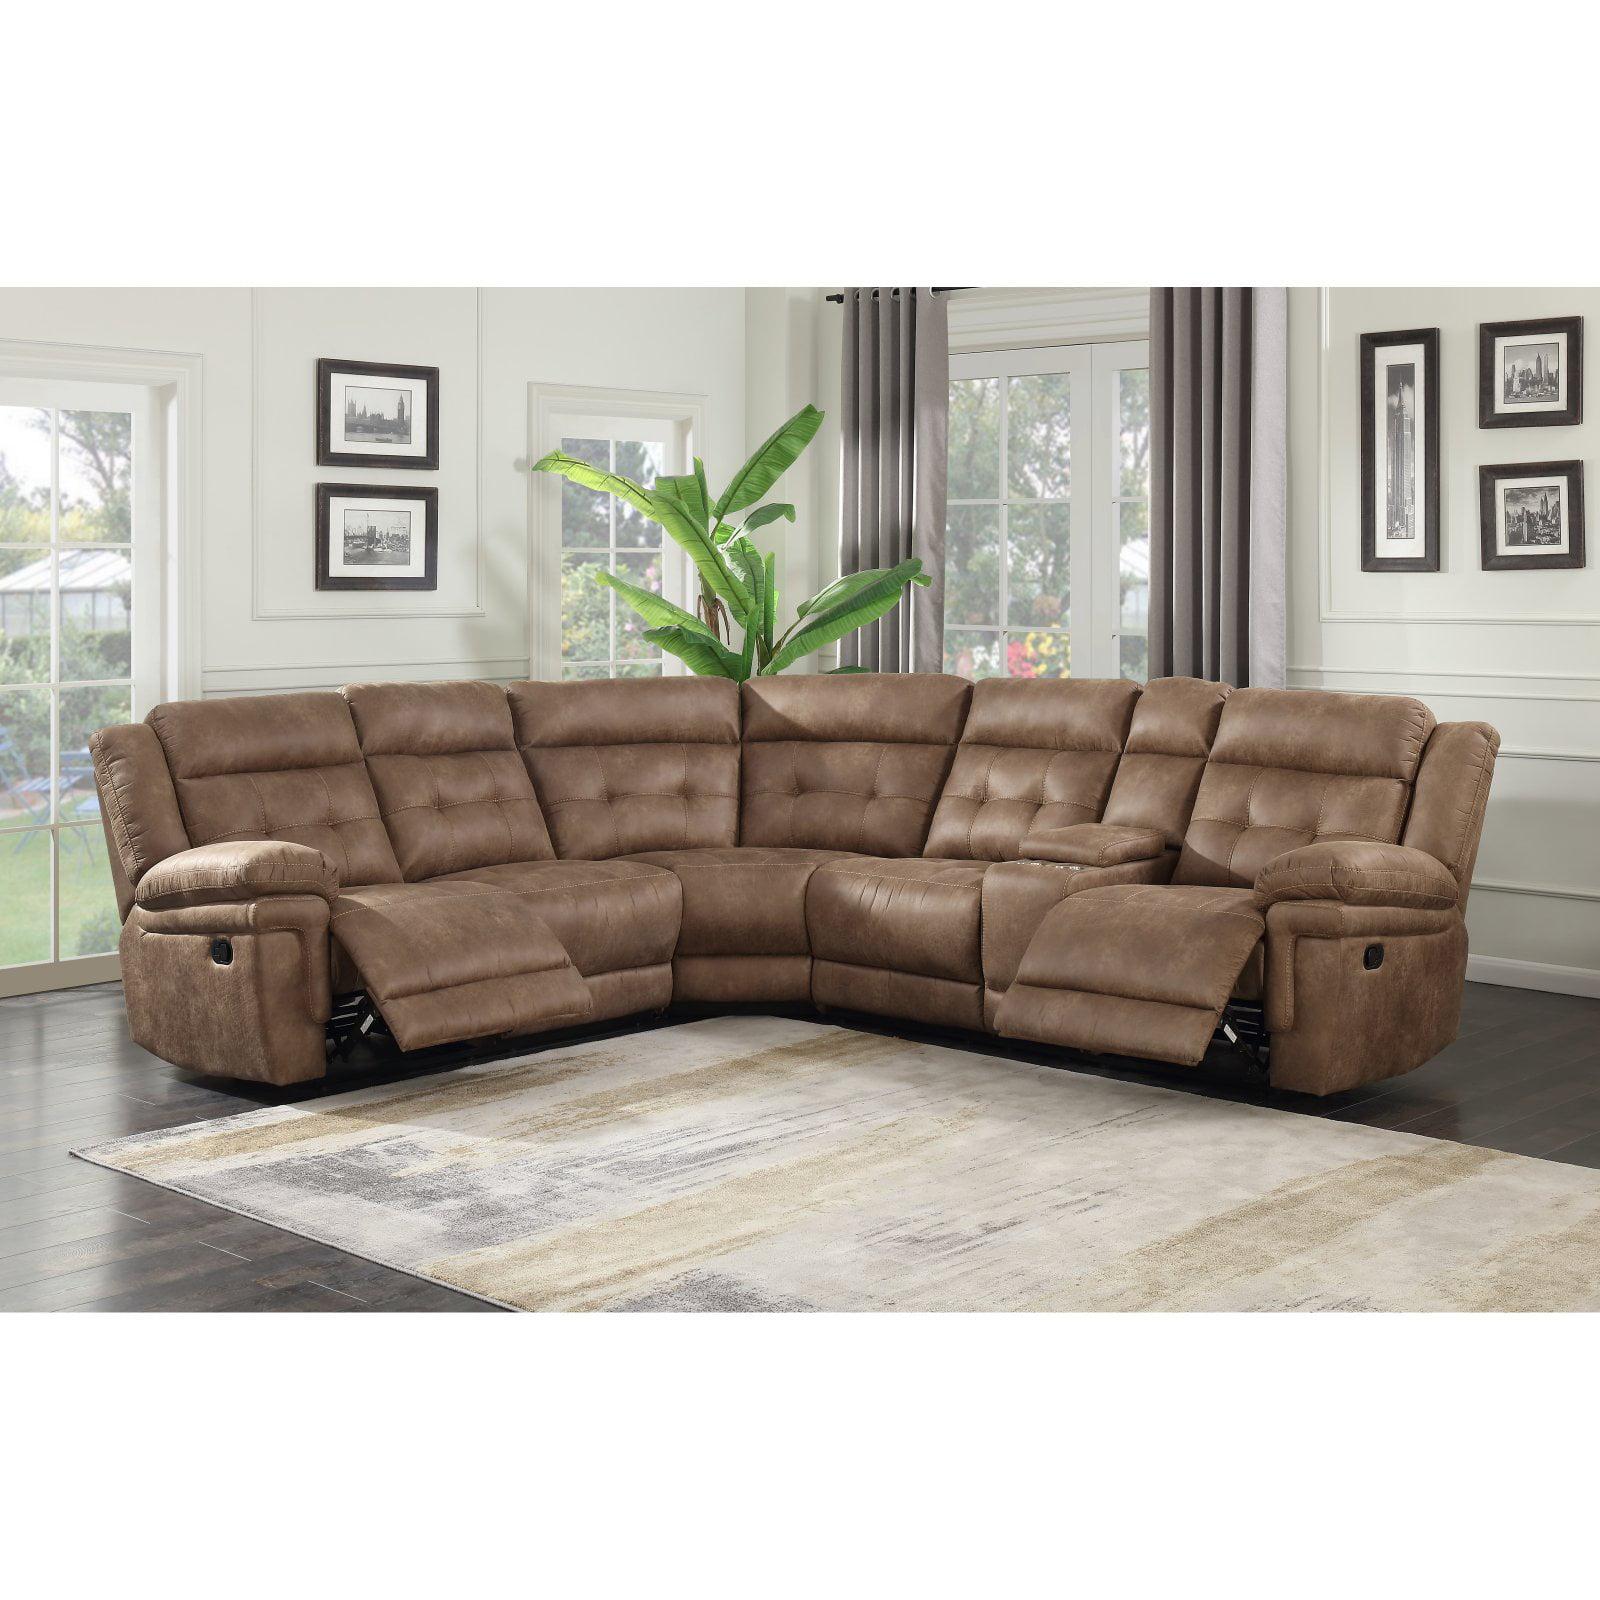 Steve Silver Co. Anastasia 3 Piece Reclining Sectional Sofa ...